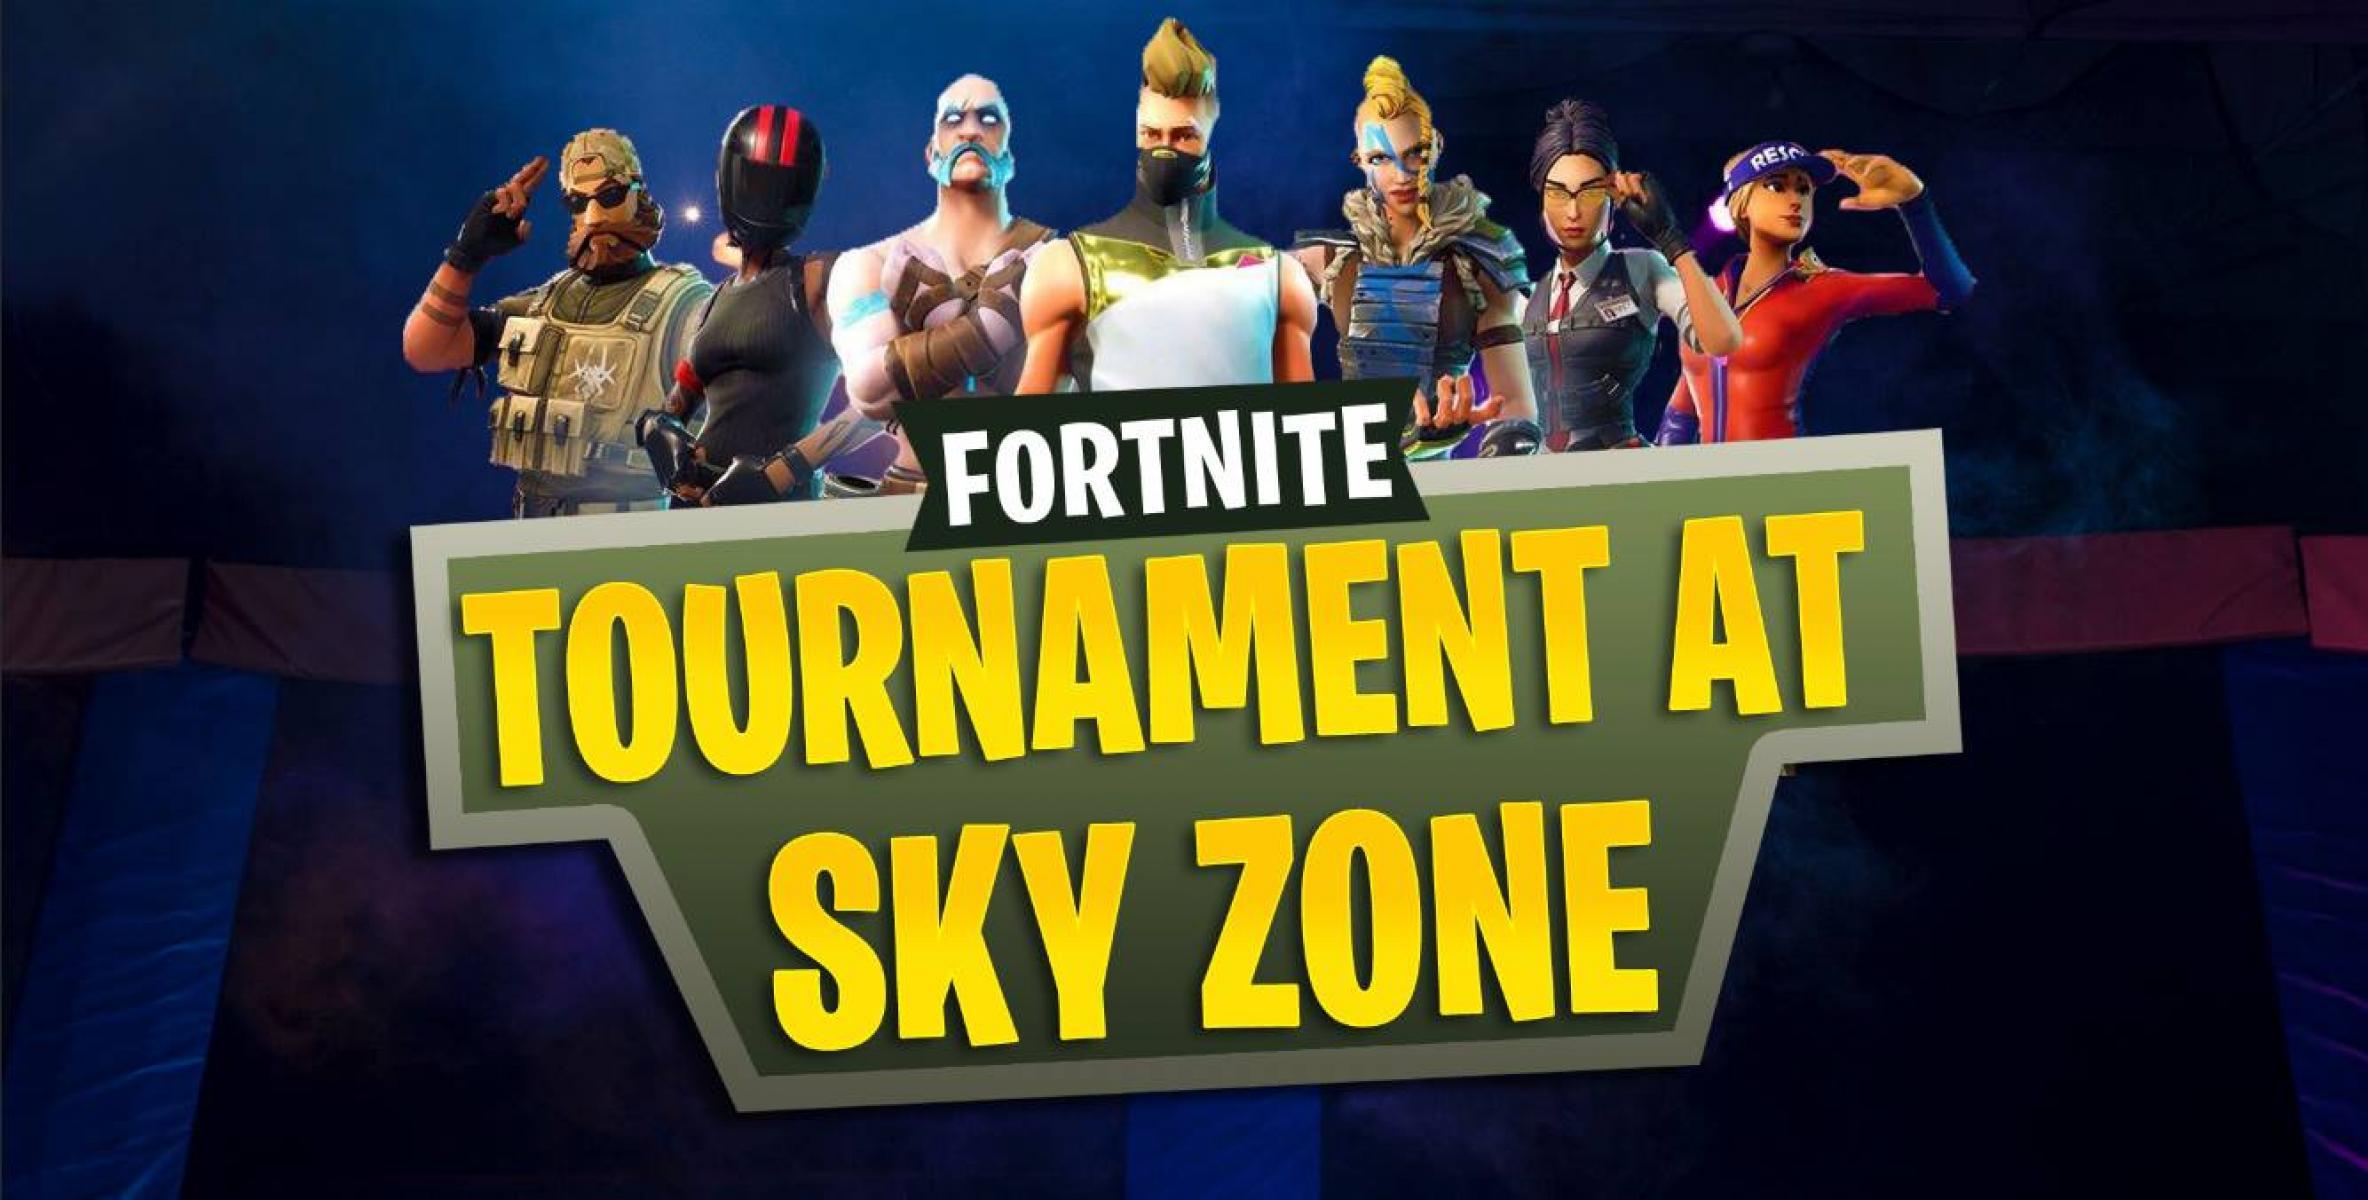 FortNite Tournament at SkyZone, Tampa FL - Sep 28, 2018 - 6